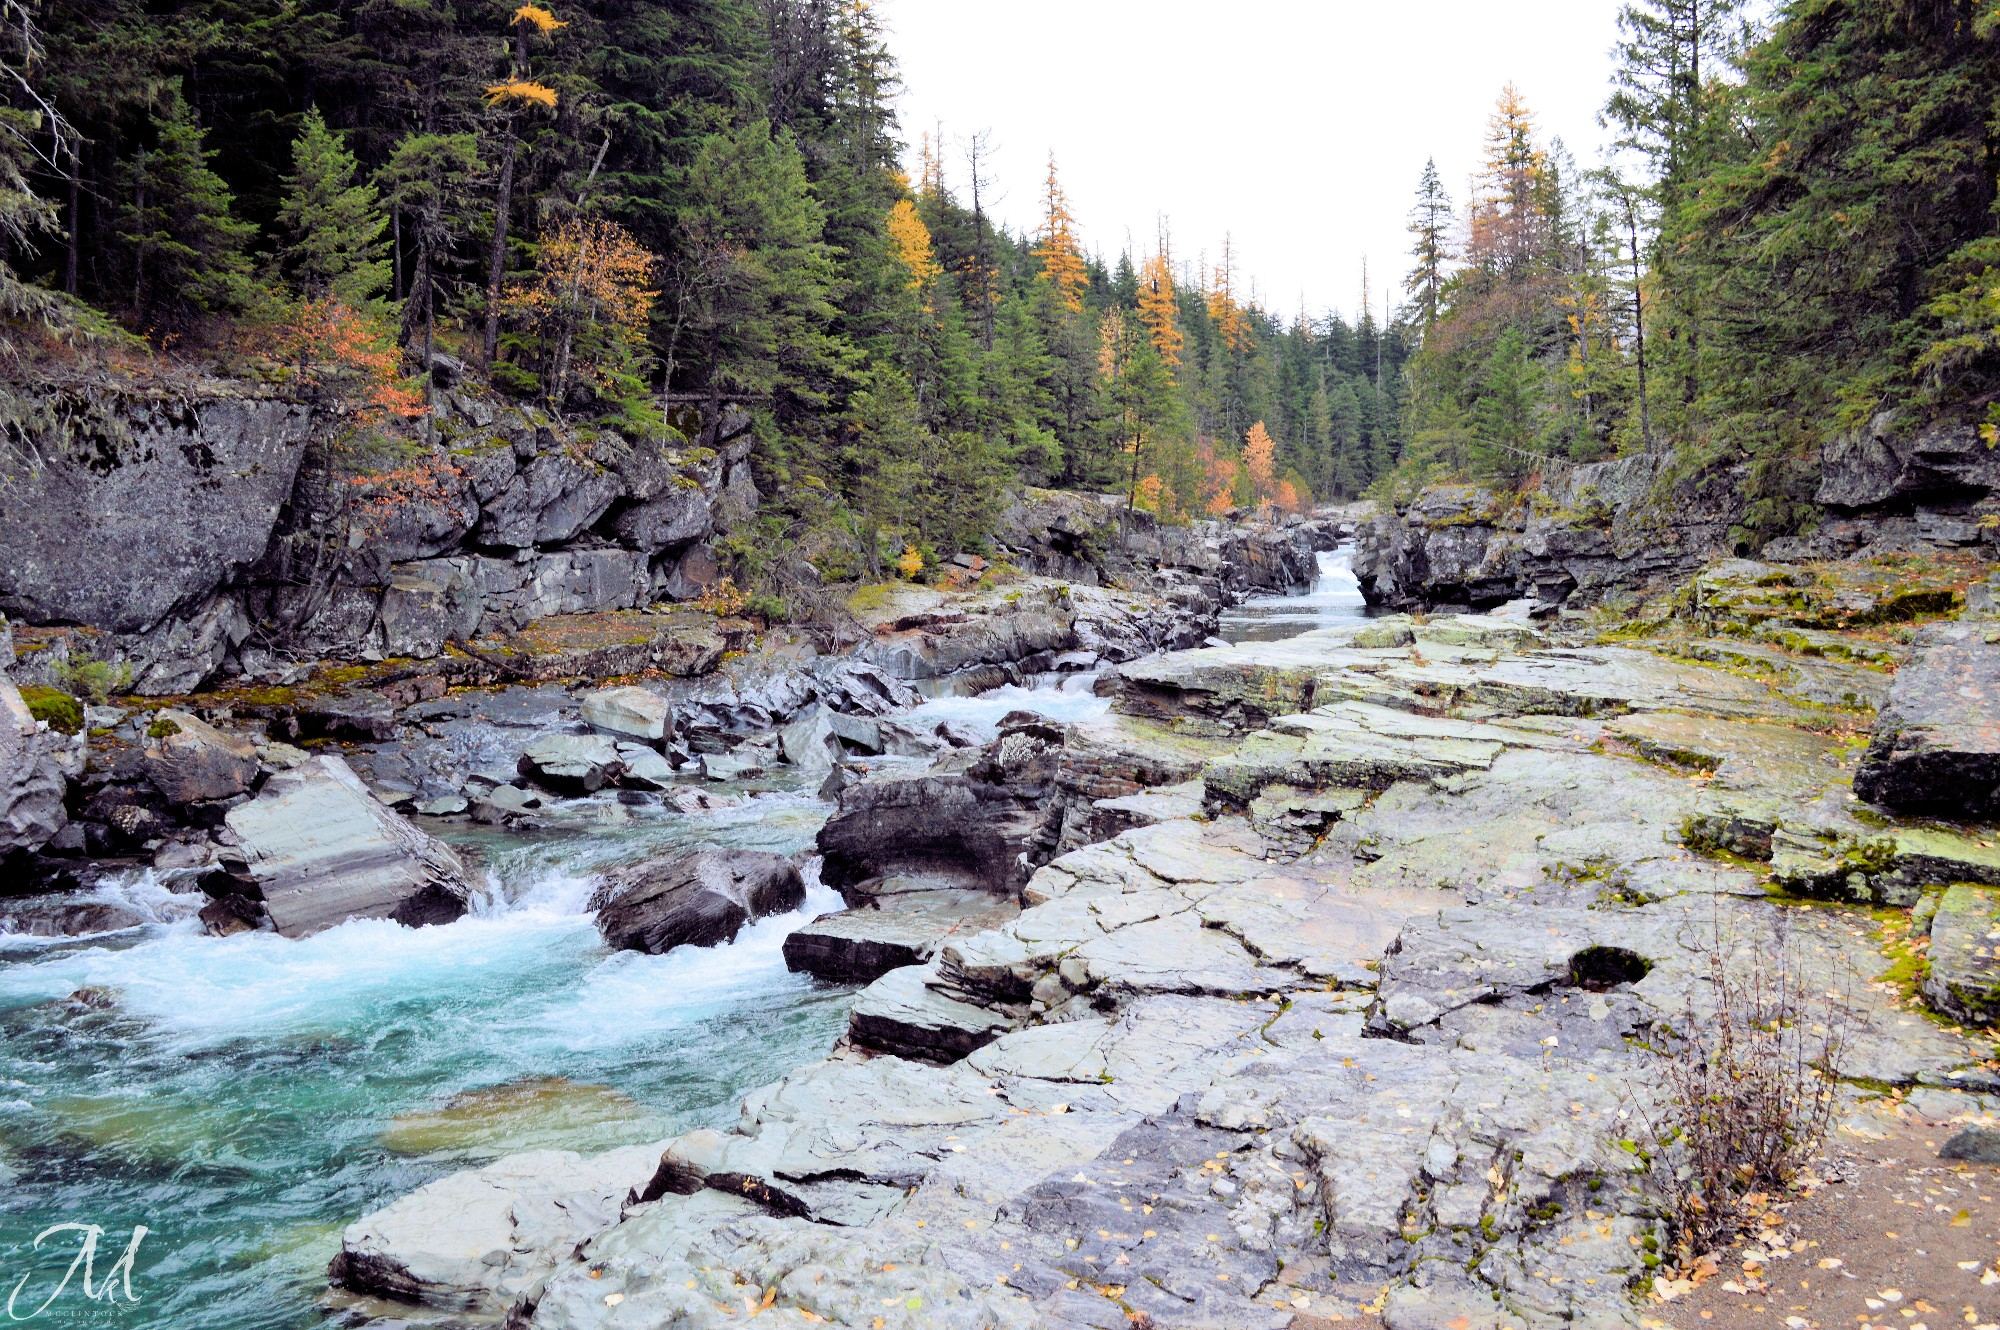 October Rain in Glacier National Park_MKMcClintock | #photography #GlacierPark #river #autumn